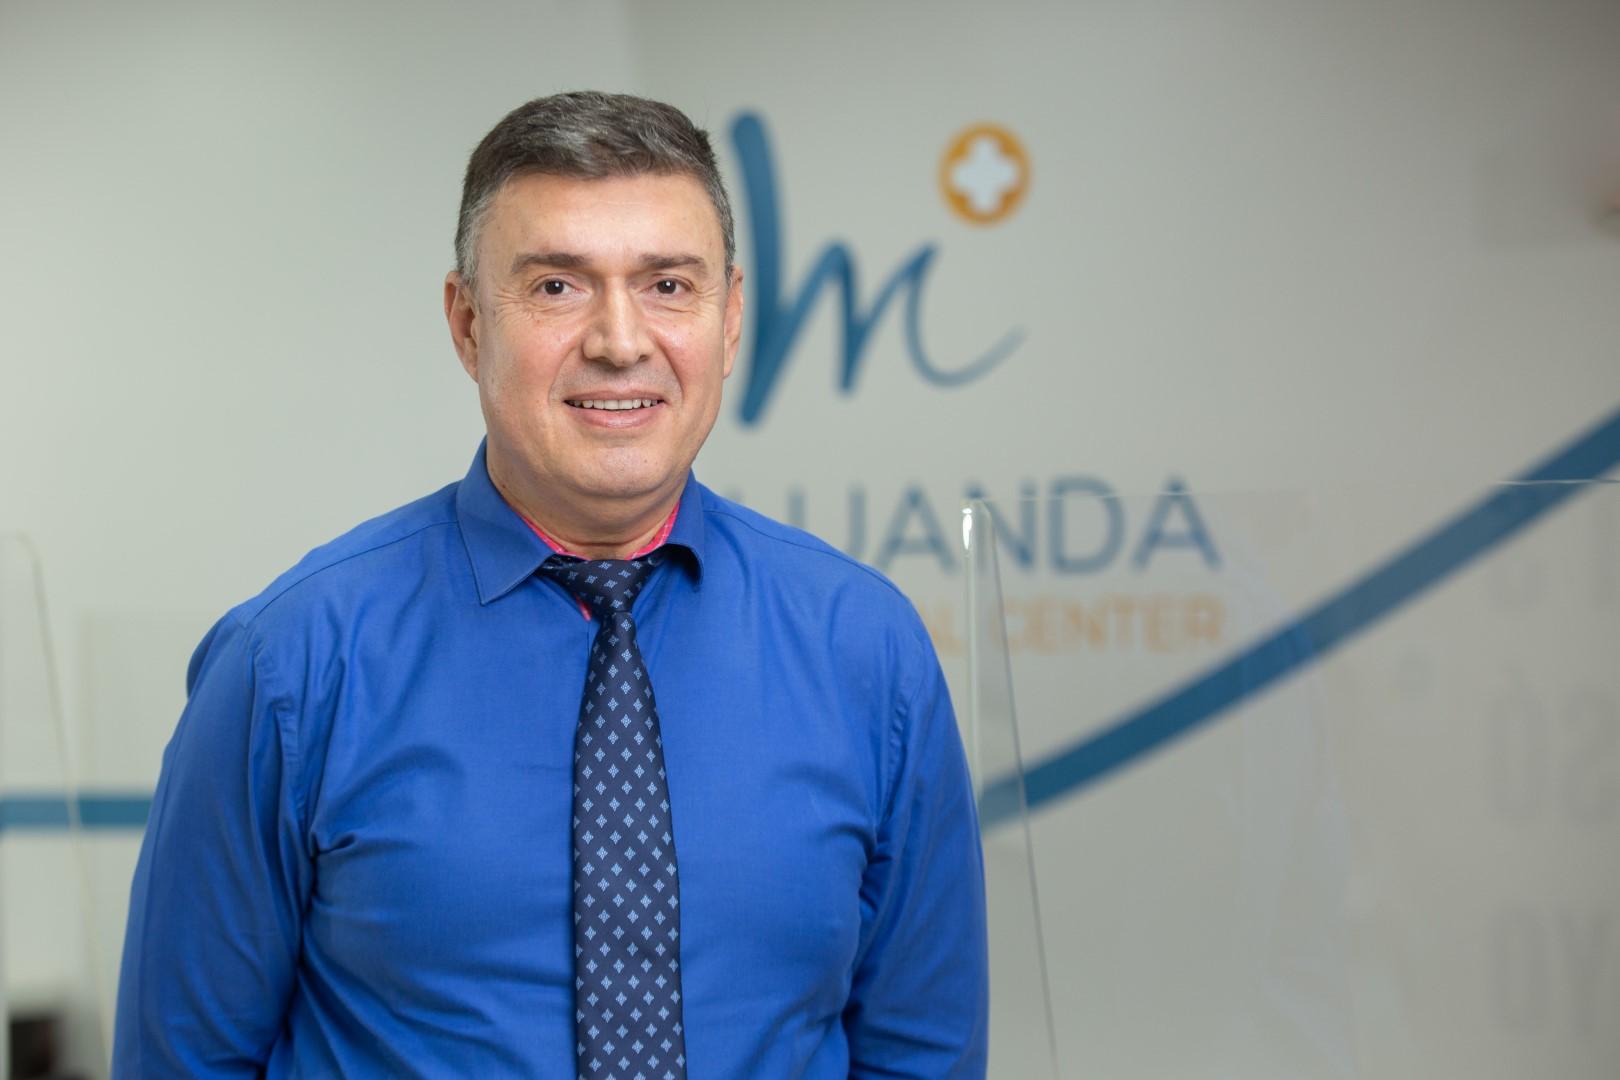 Dr Justin Gavanescu LMC